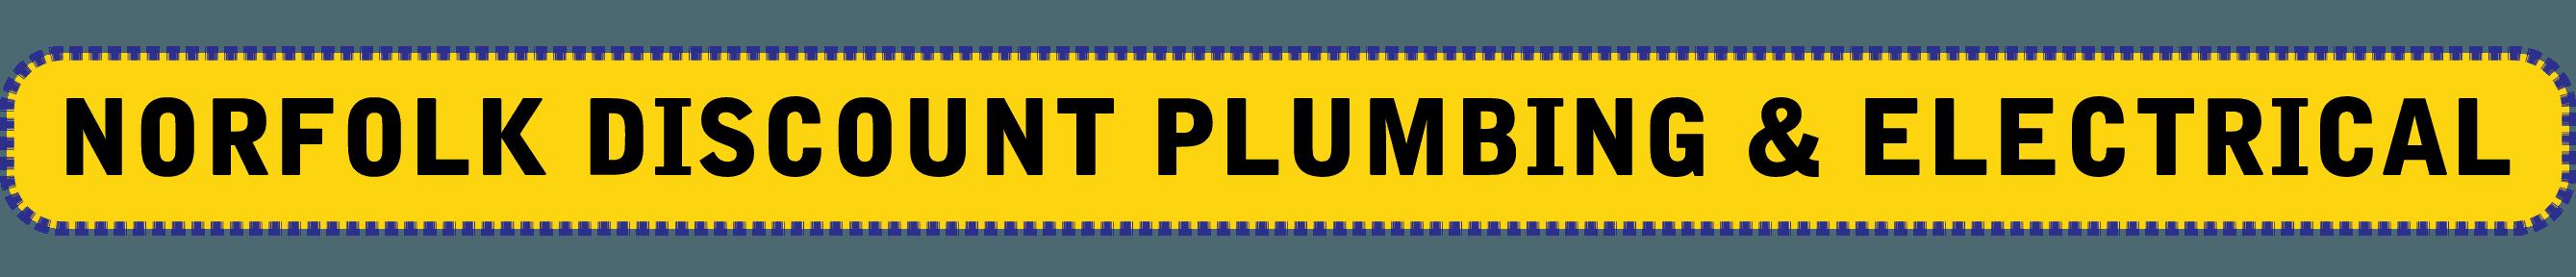 Norfolk Discount Plumbing & Electrical Ltd logo